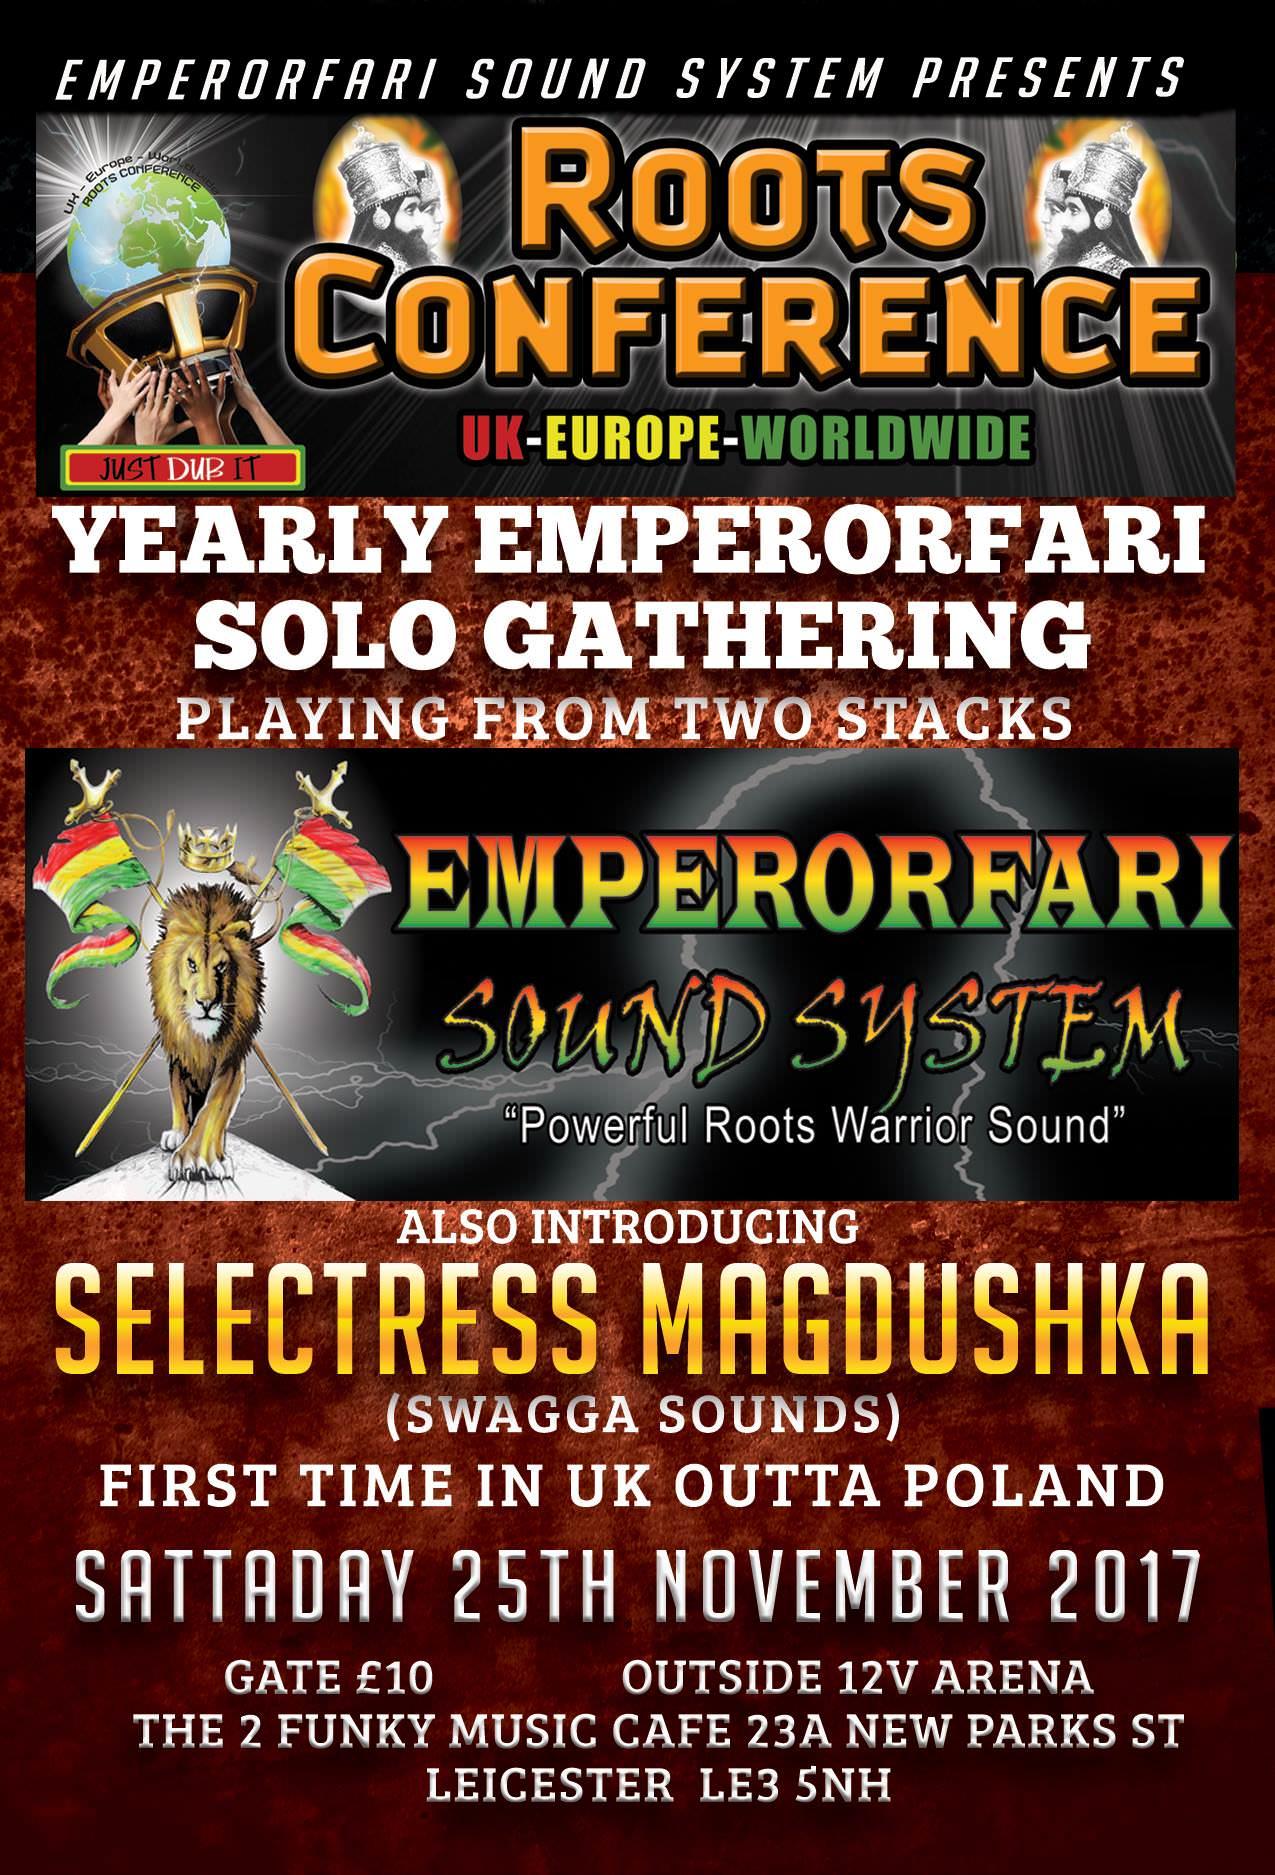 "EMPERORFARI MEETS IRON SELECTRESS MAGDUSHKA ROOTS CONFERENCE YEARLY ""SOLO"" GATHERING"